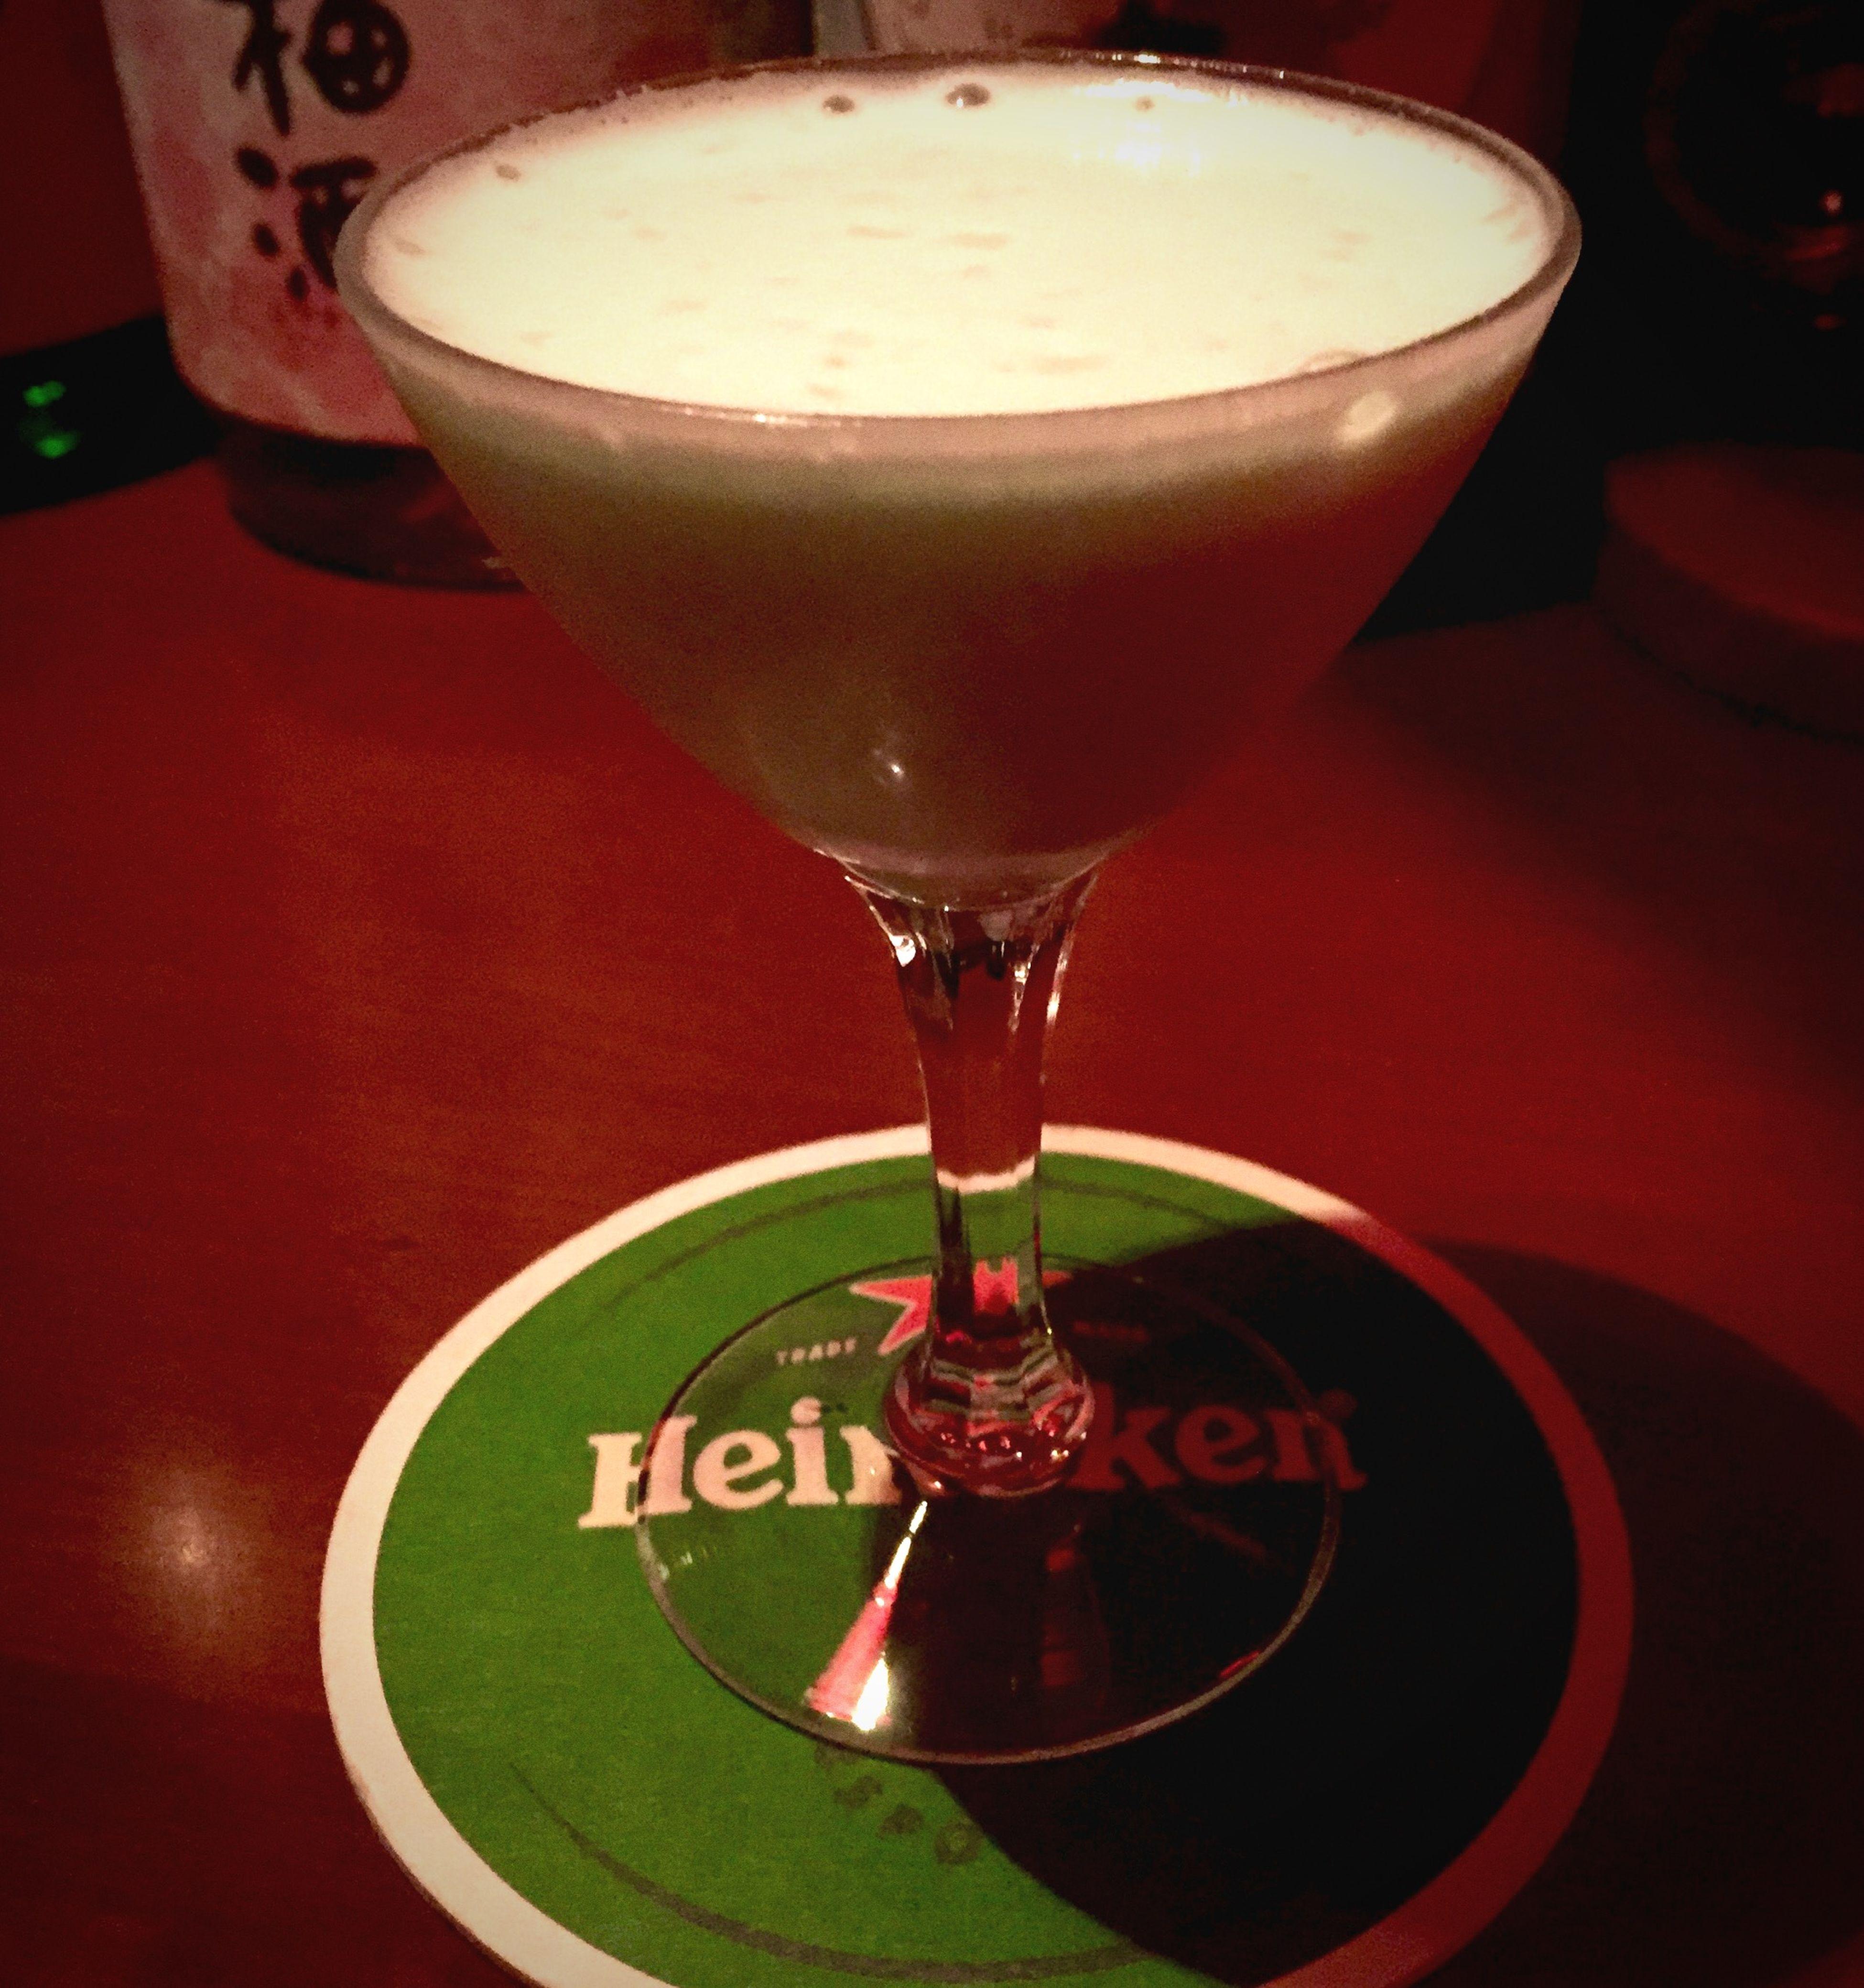 Enjoying Life Nightlife Bar Cocktails Glasshopper Relaxing